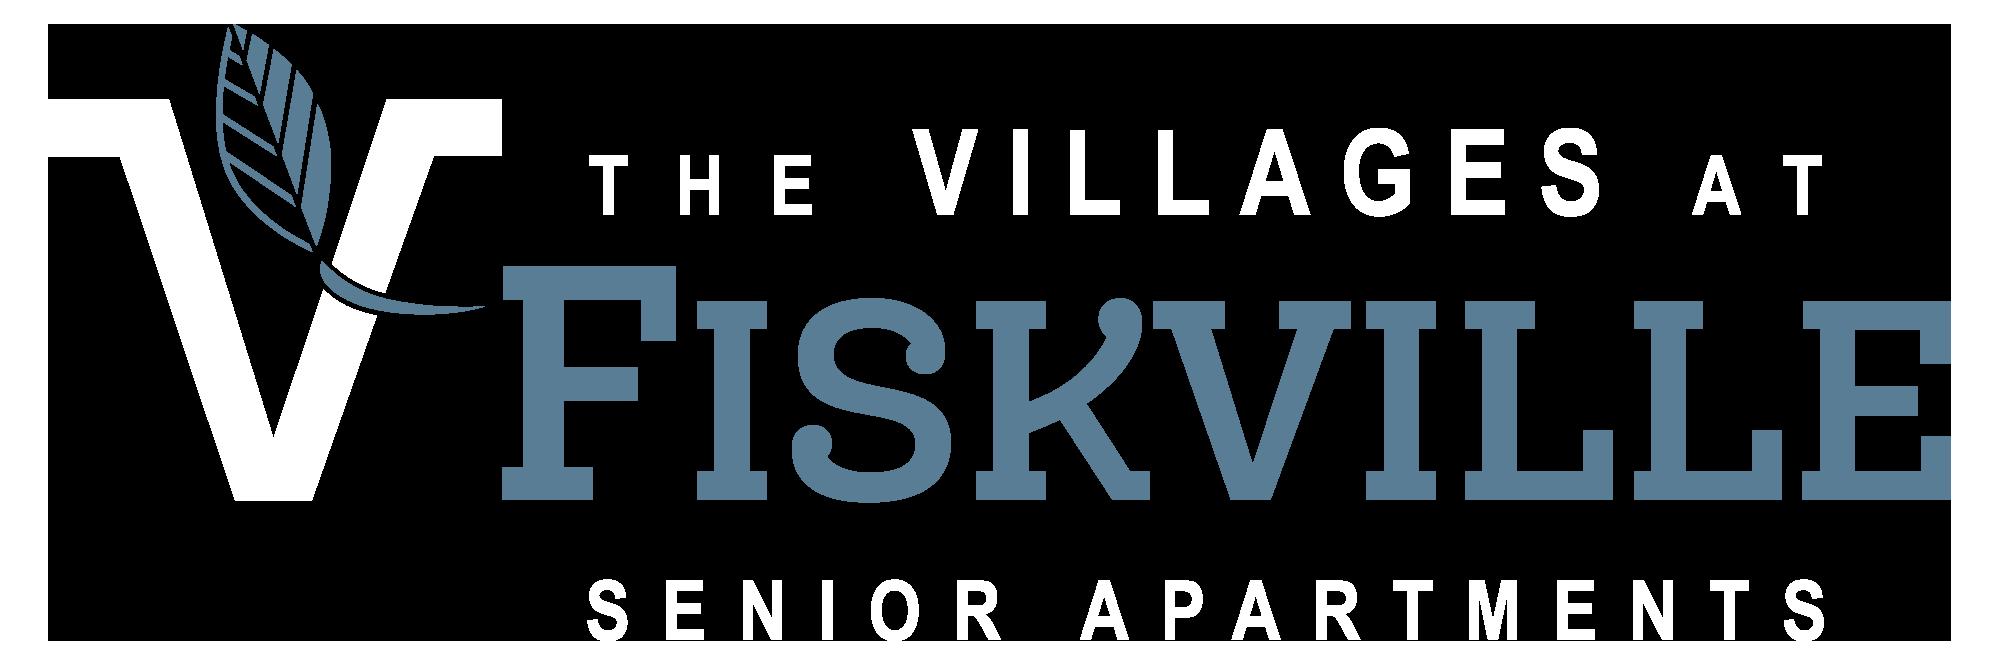 The Villages at Fiskville Senior Apartments